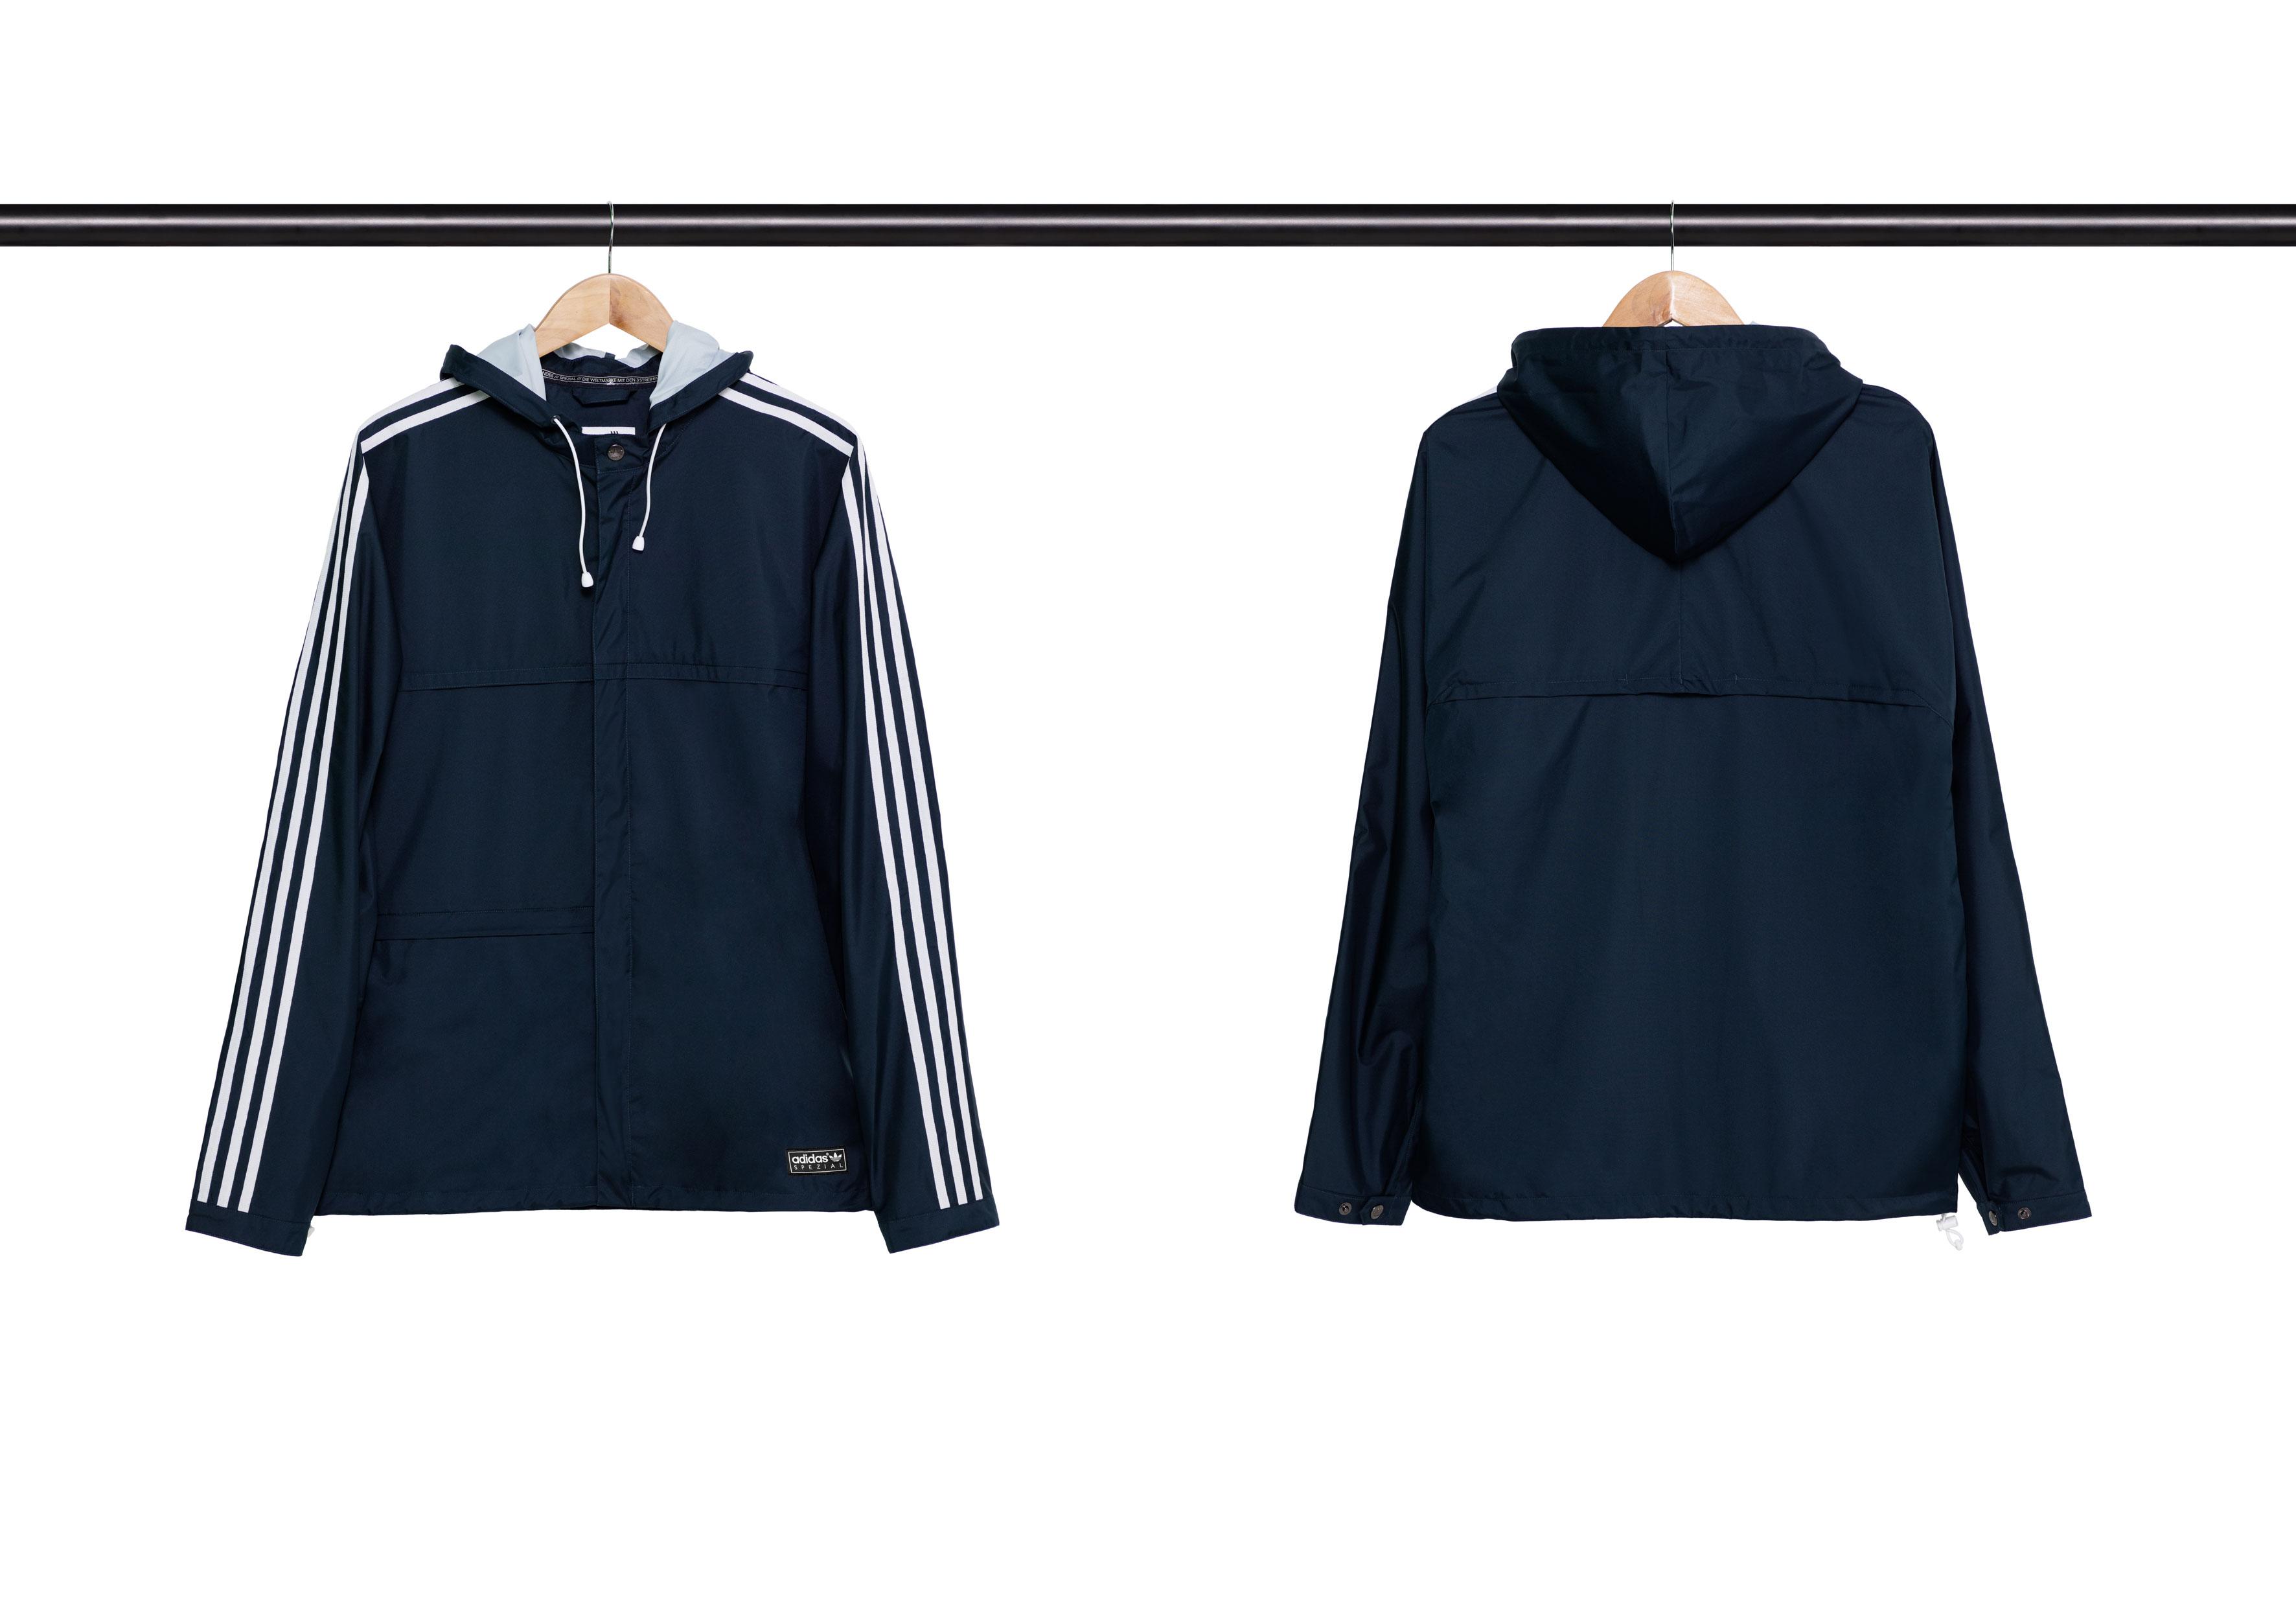 Adidas Originals X Spezial Spring Summer 15 Proper Magazine